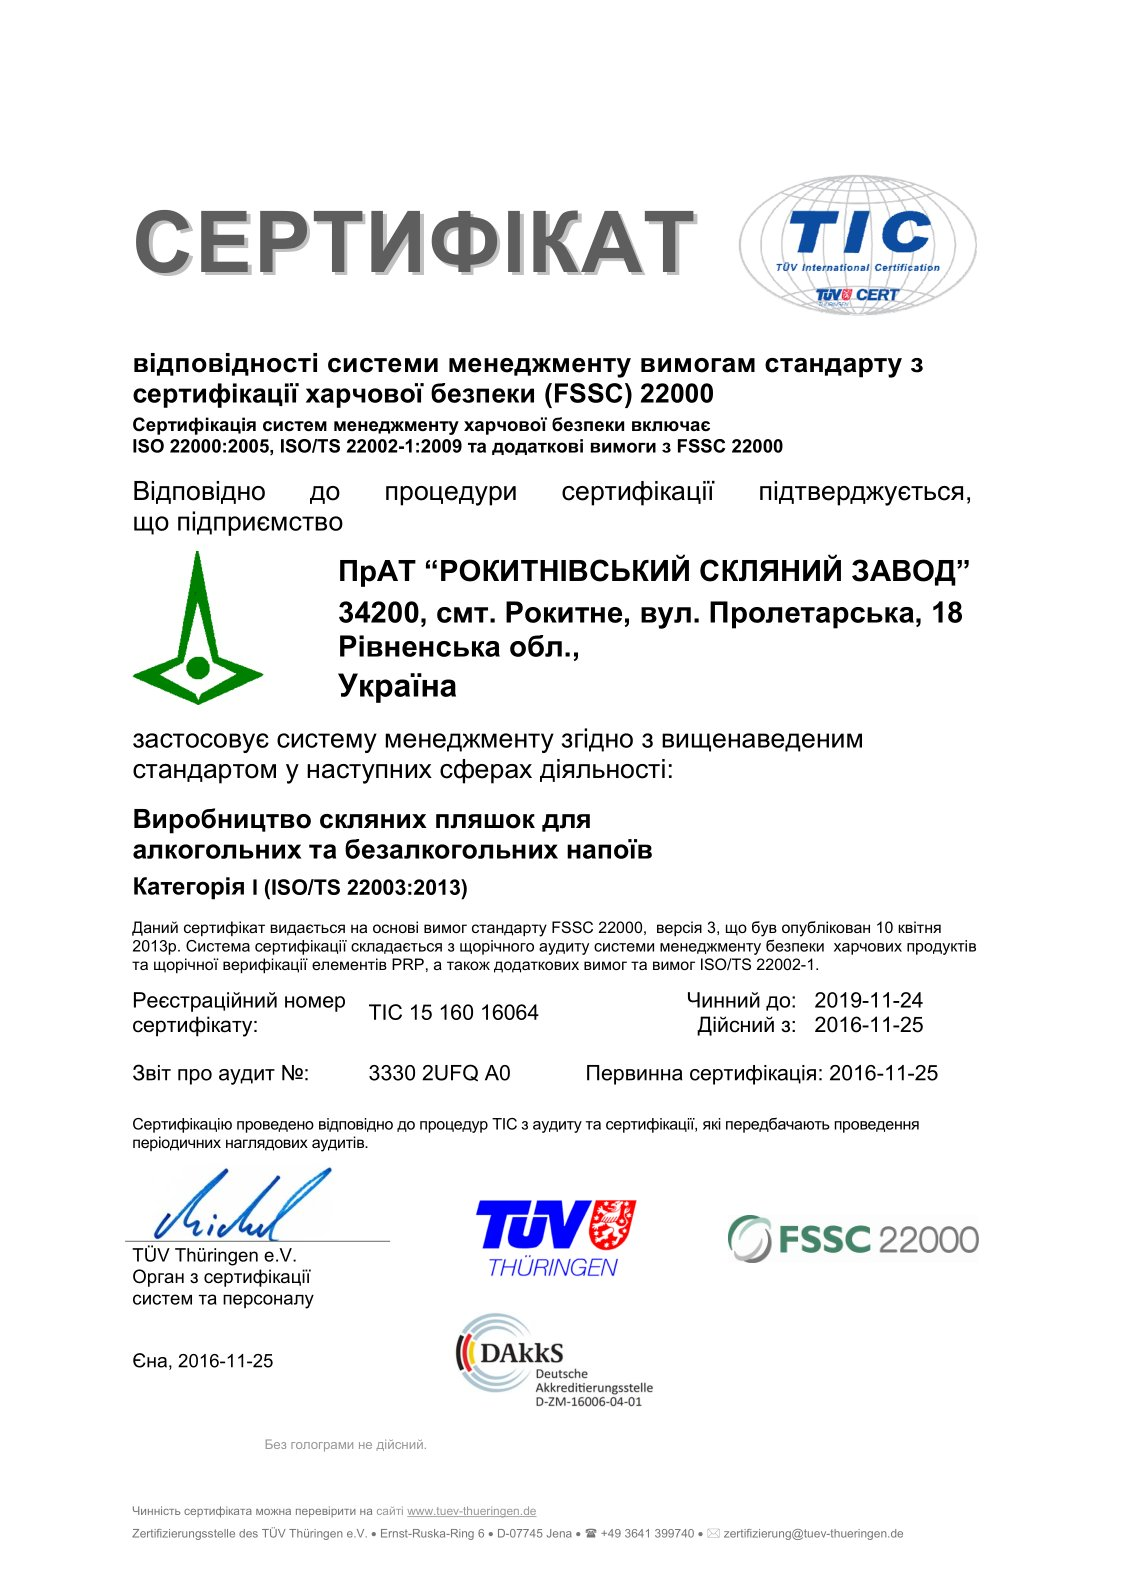 2UFQA02016160_ukrainisch_1